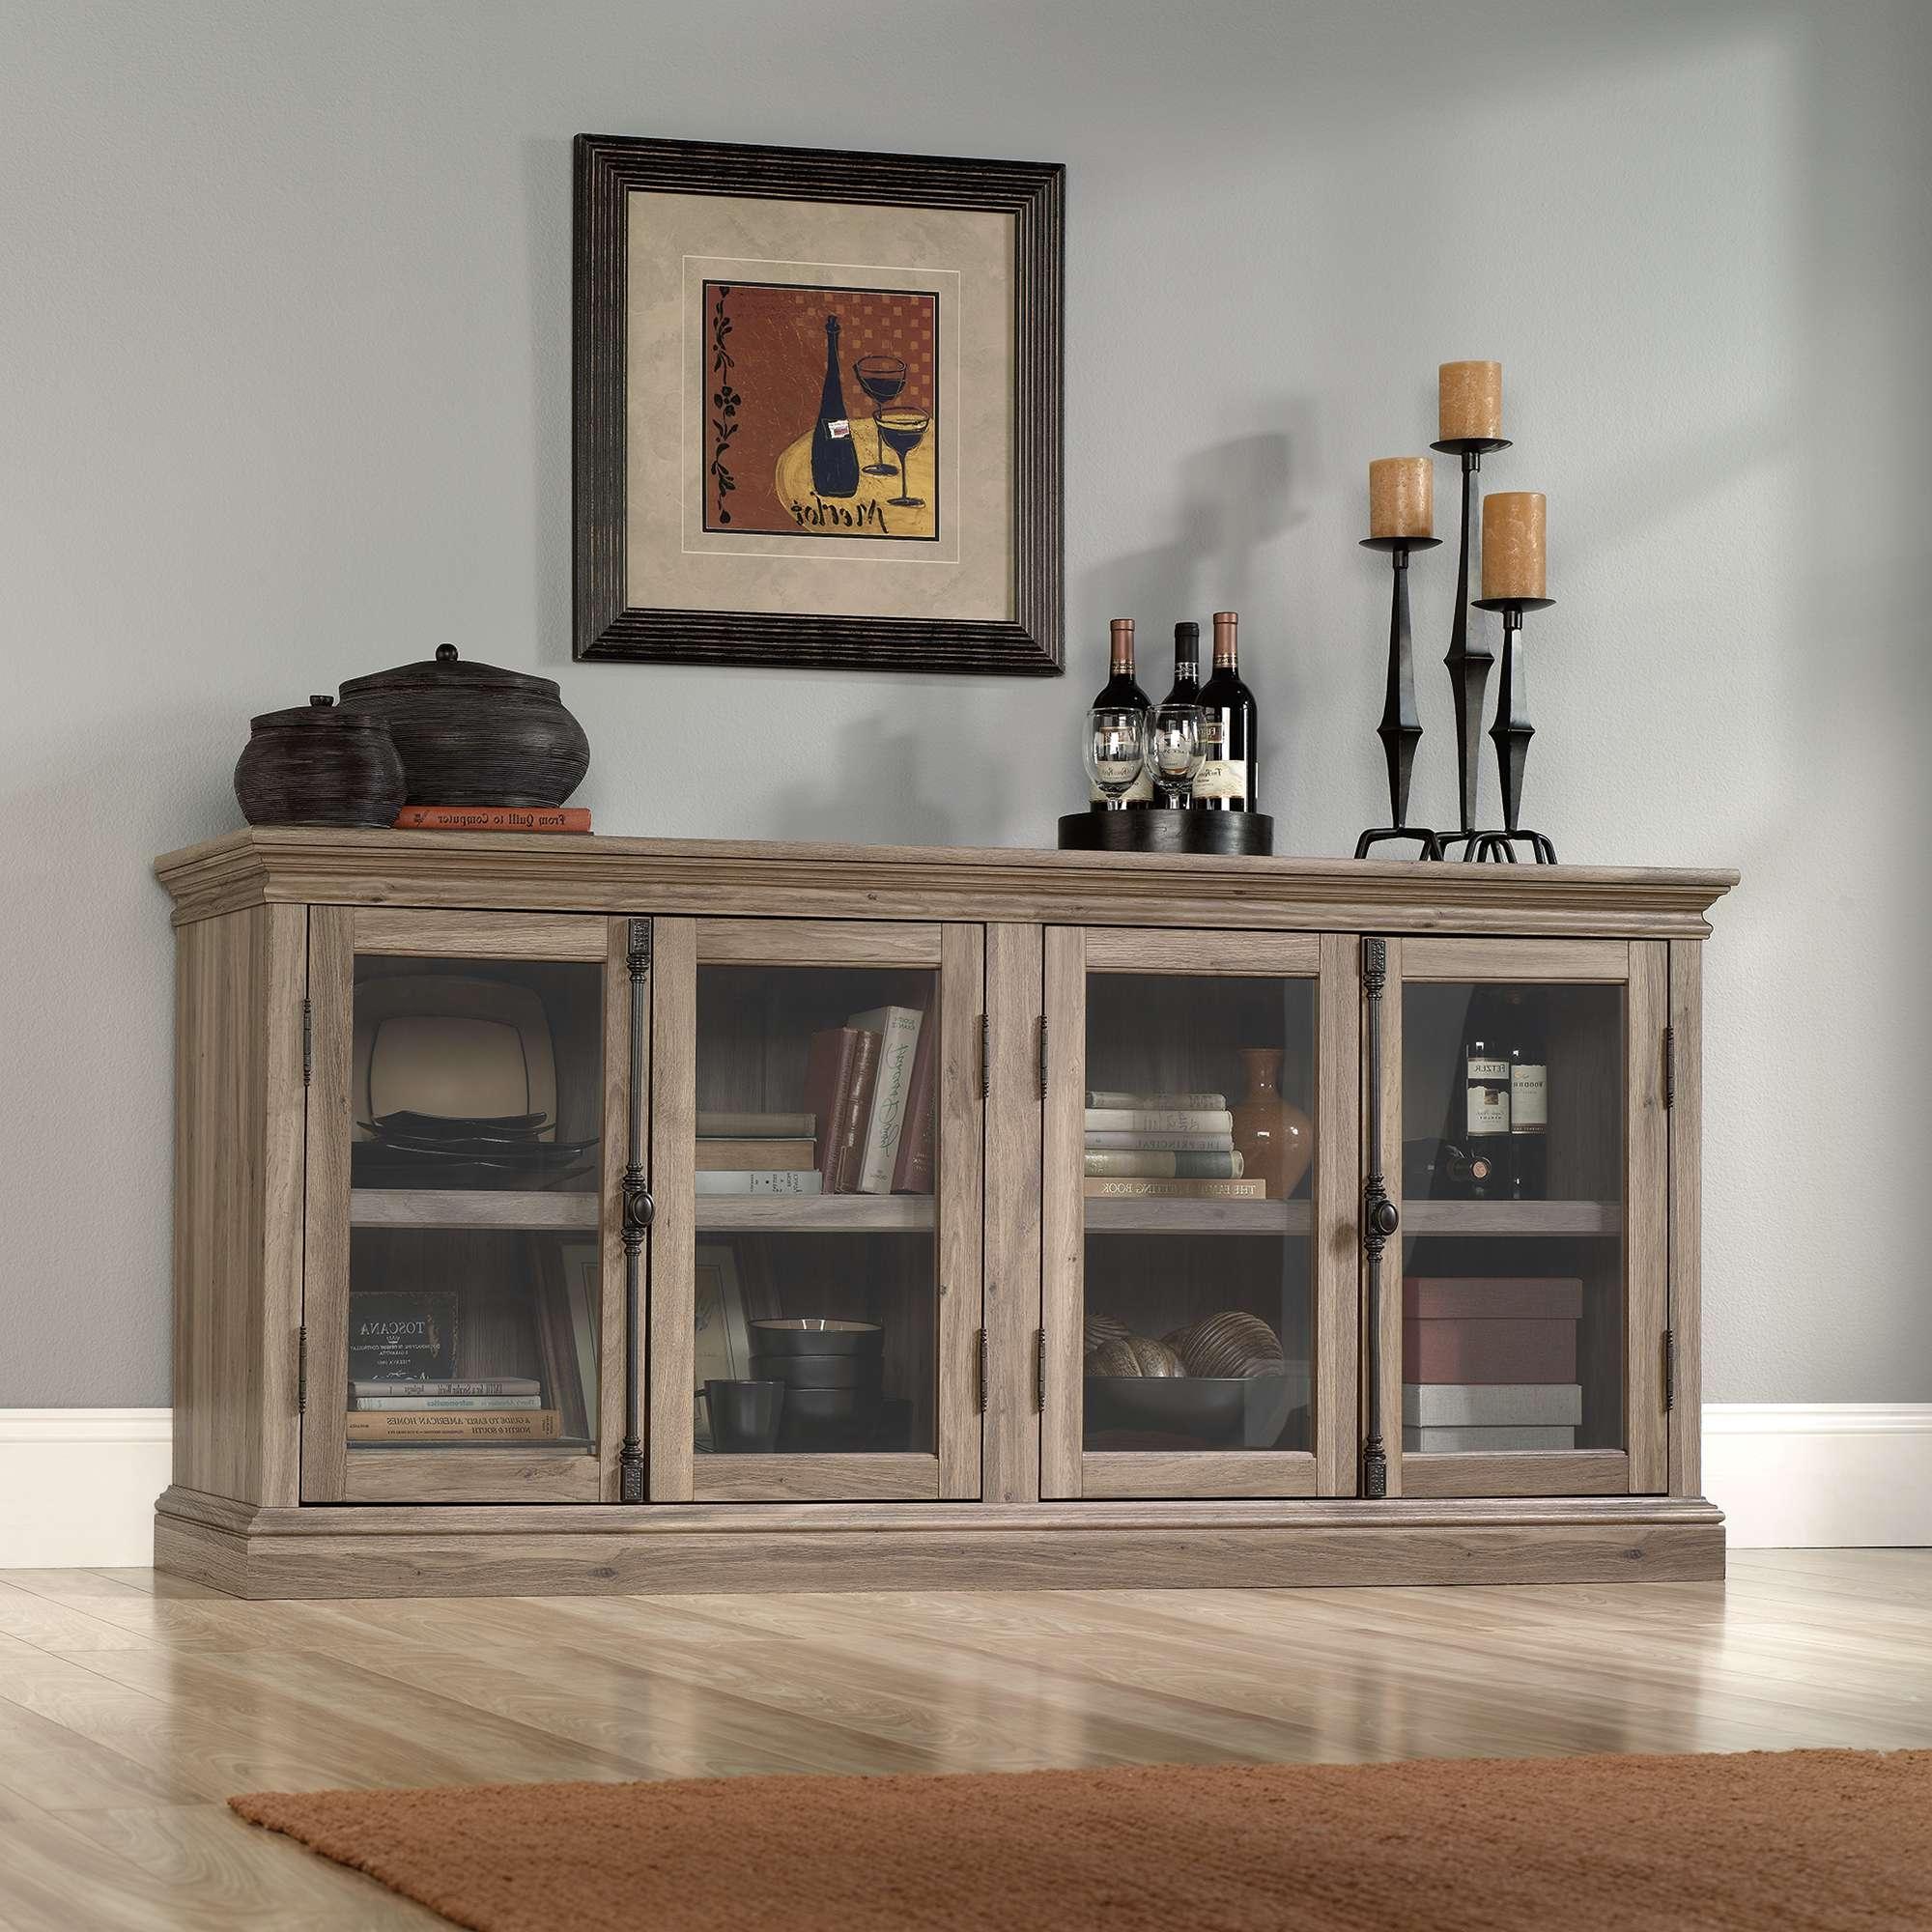 Stunning Salt Oak Furniture Tv Stand Creative Stair Railings With In Oak Furniture Tv Stands (View 12 of 20)